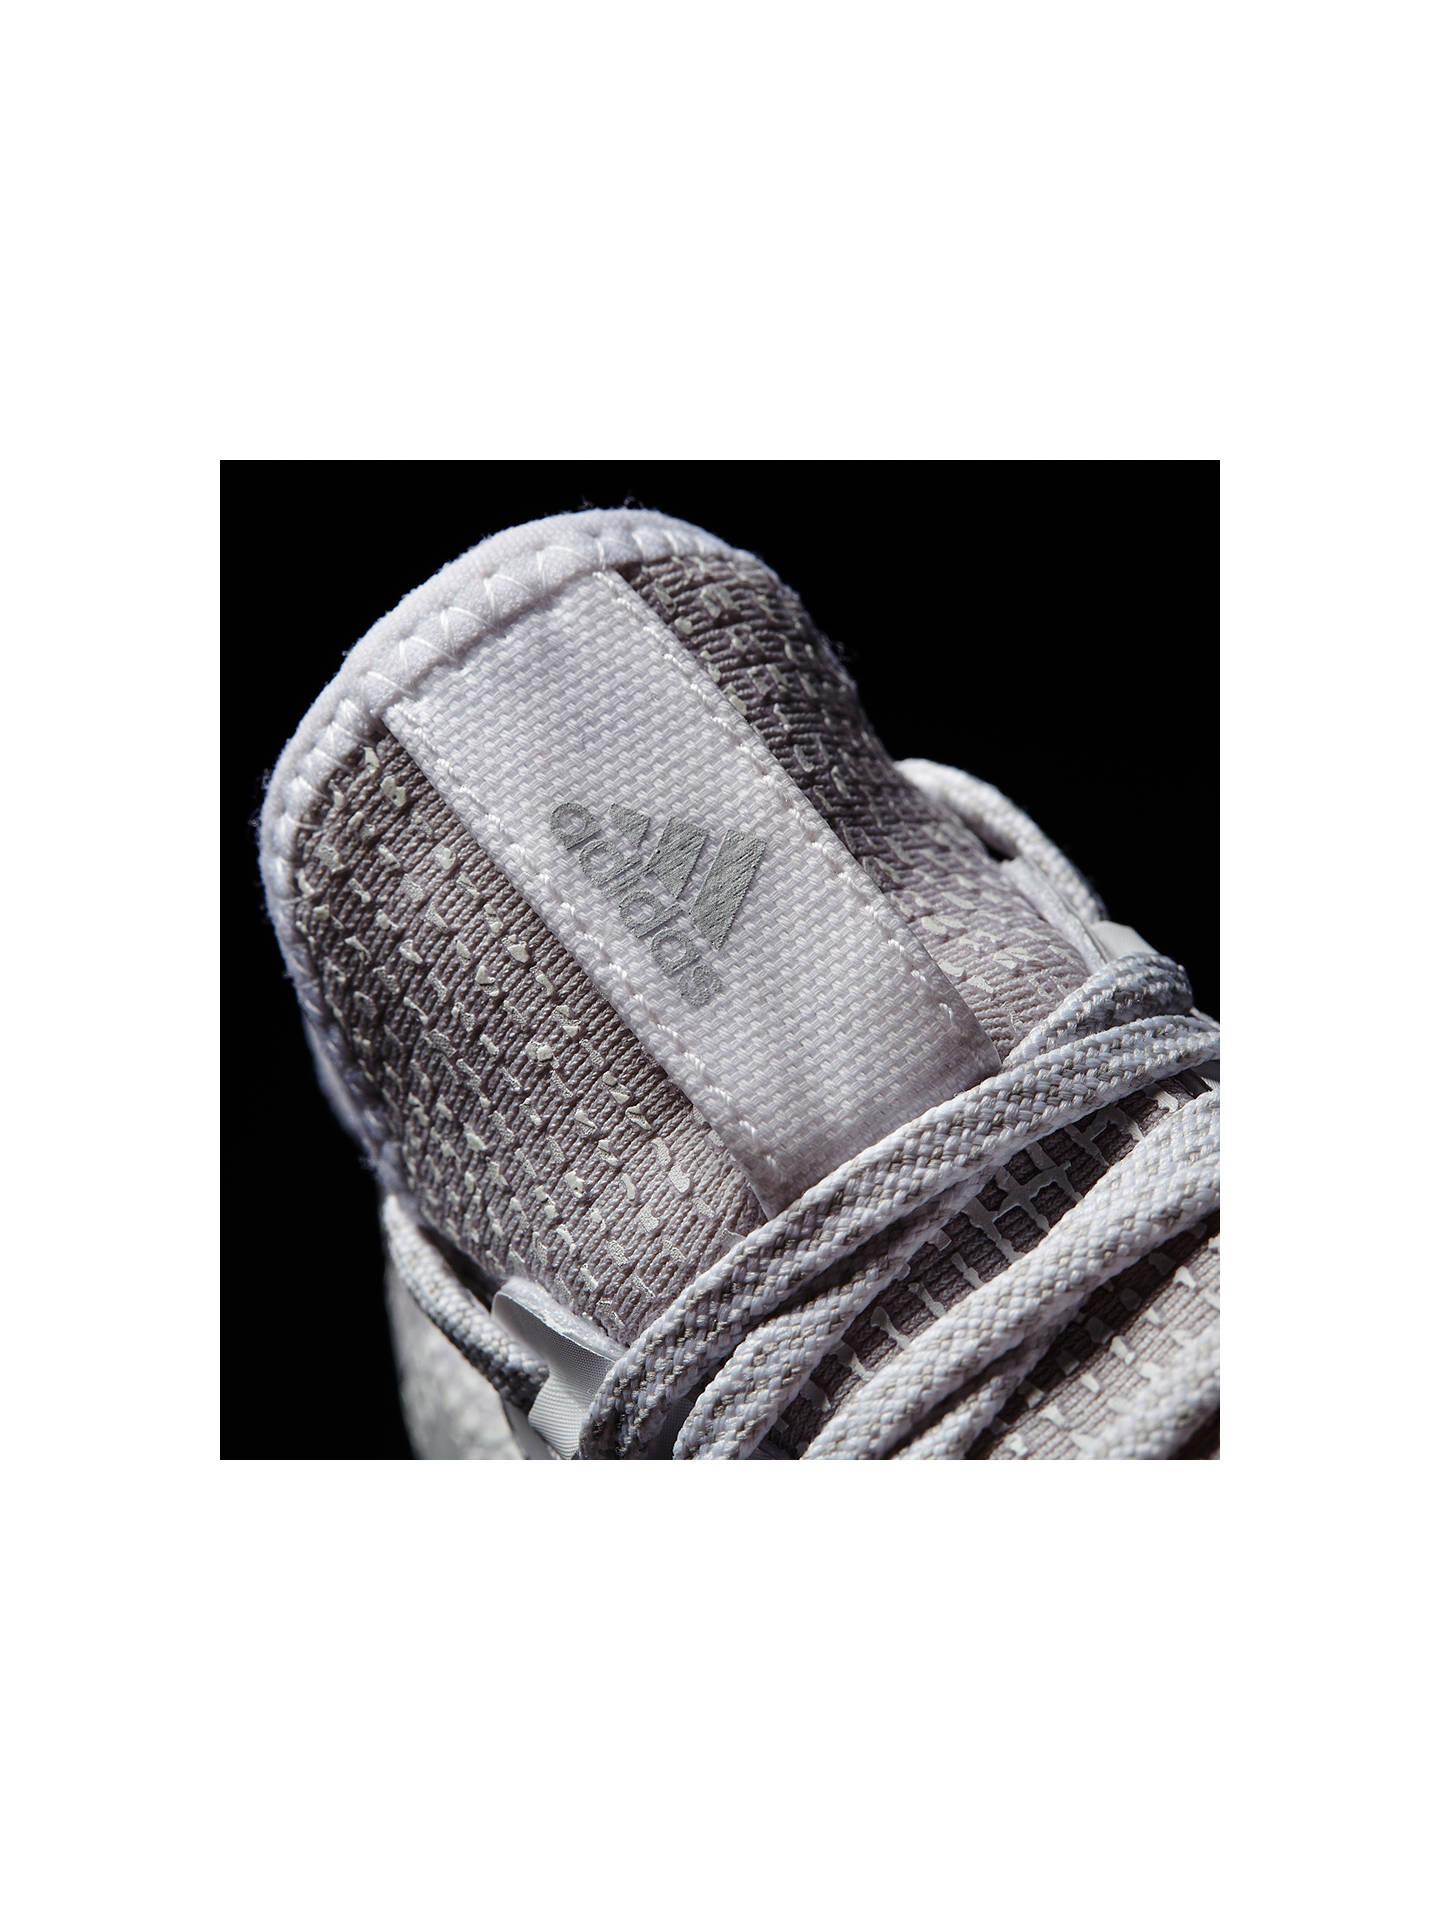 e7002ba5e7dc9 ... Buy Adidas Pureboost All-Terrain Women s Running Shoes